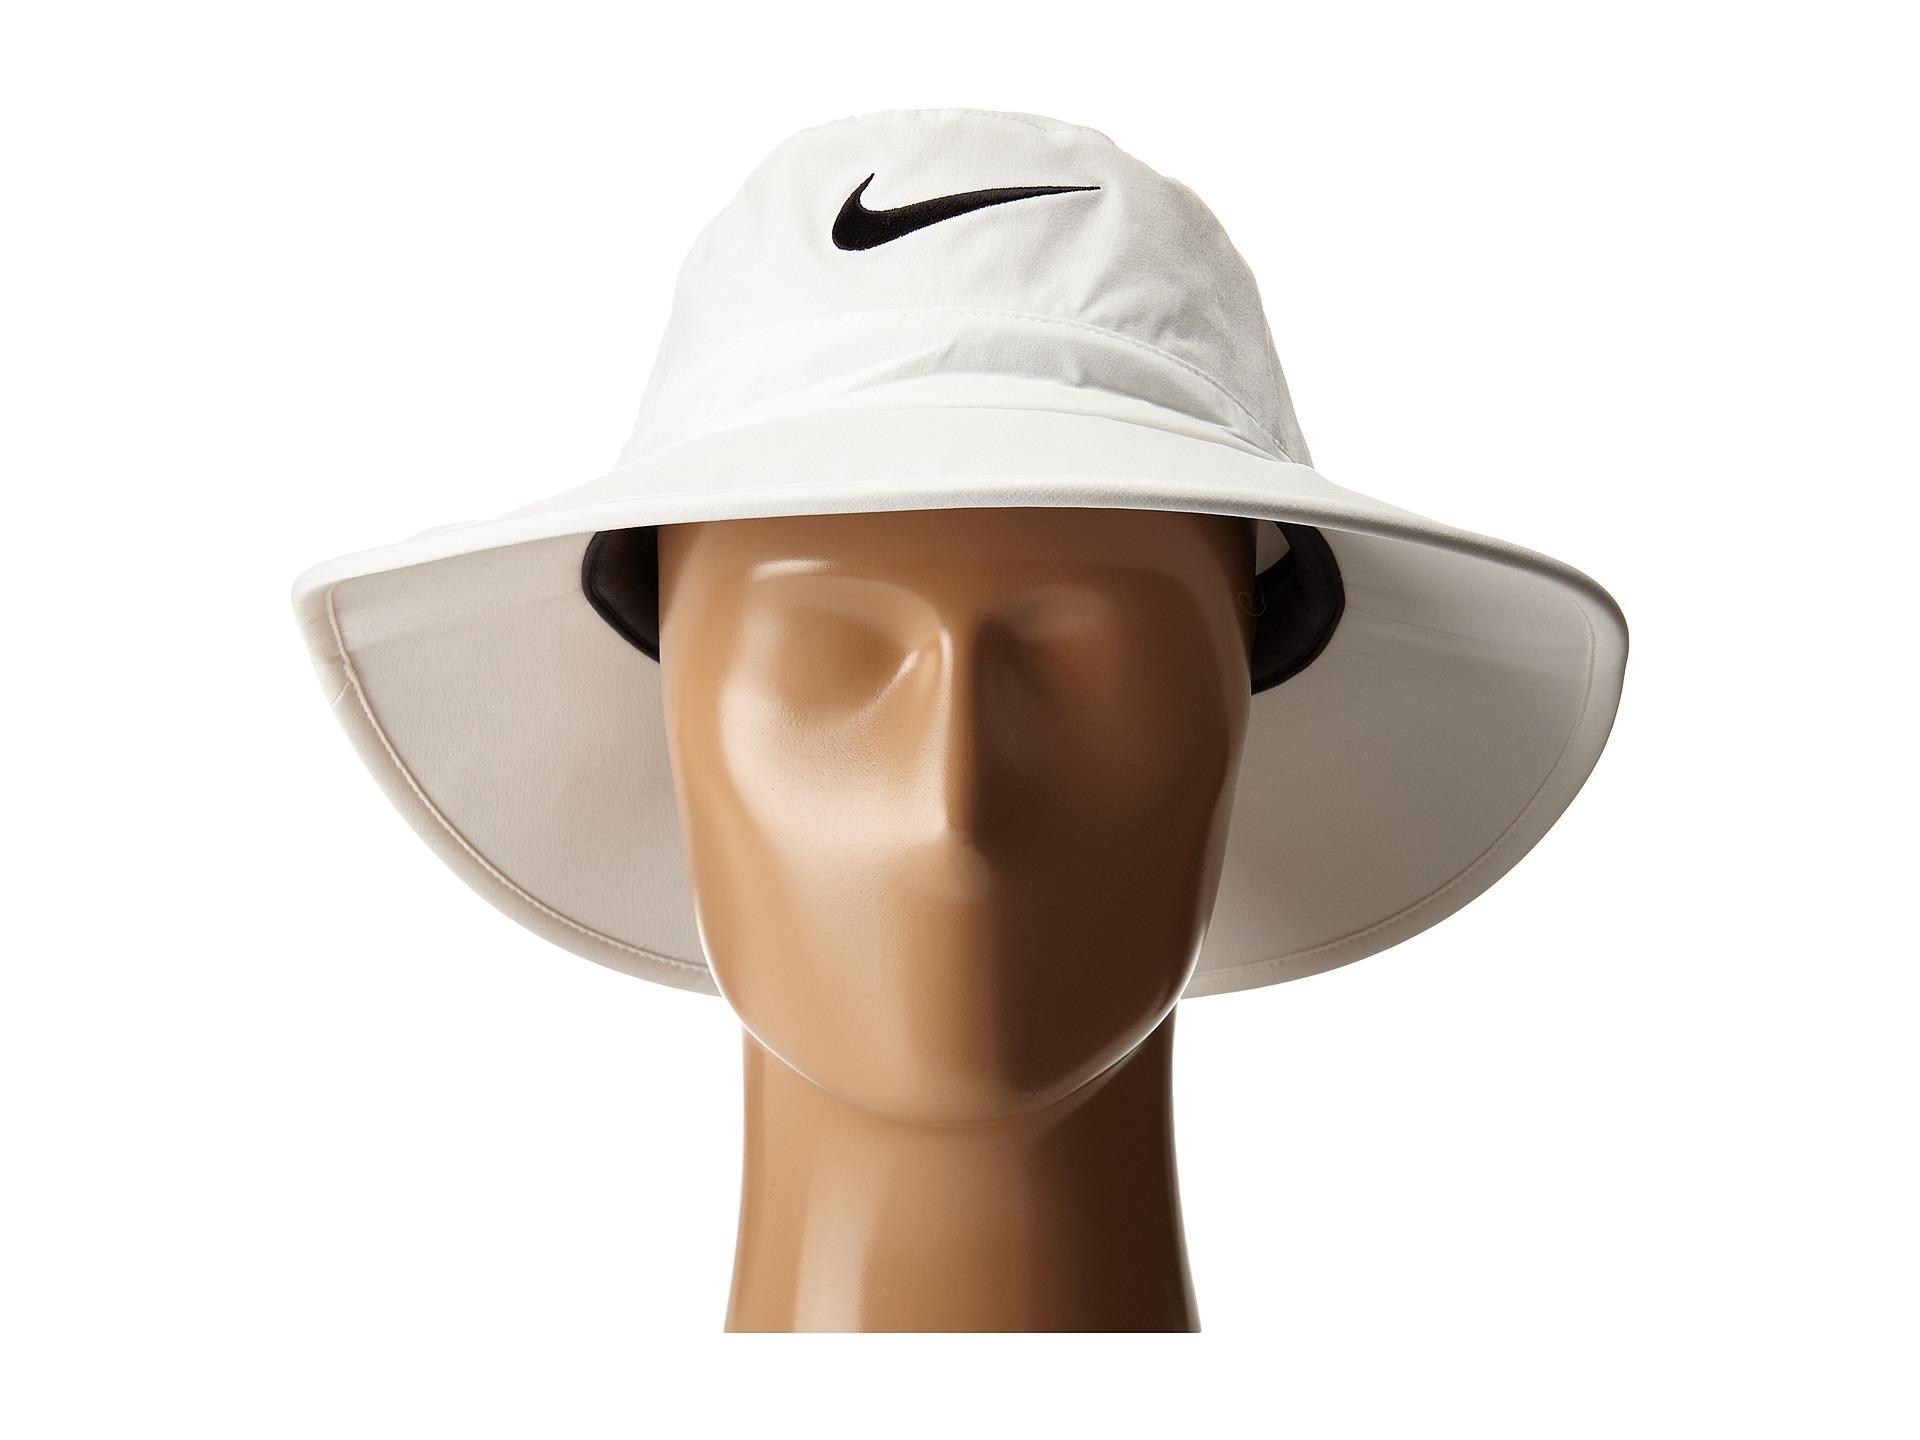 21762e71035 Lyst - Nike Sun Protect Bucket Cap in White for Men